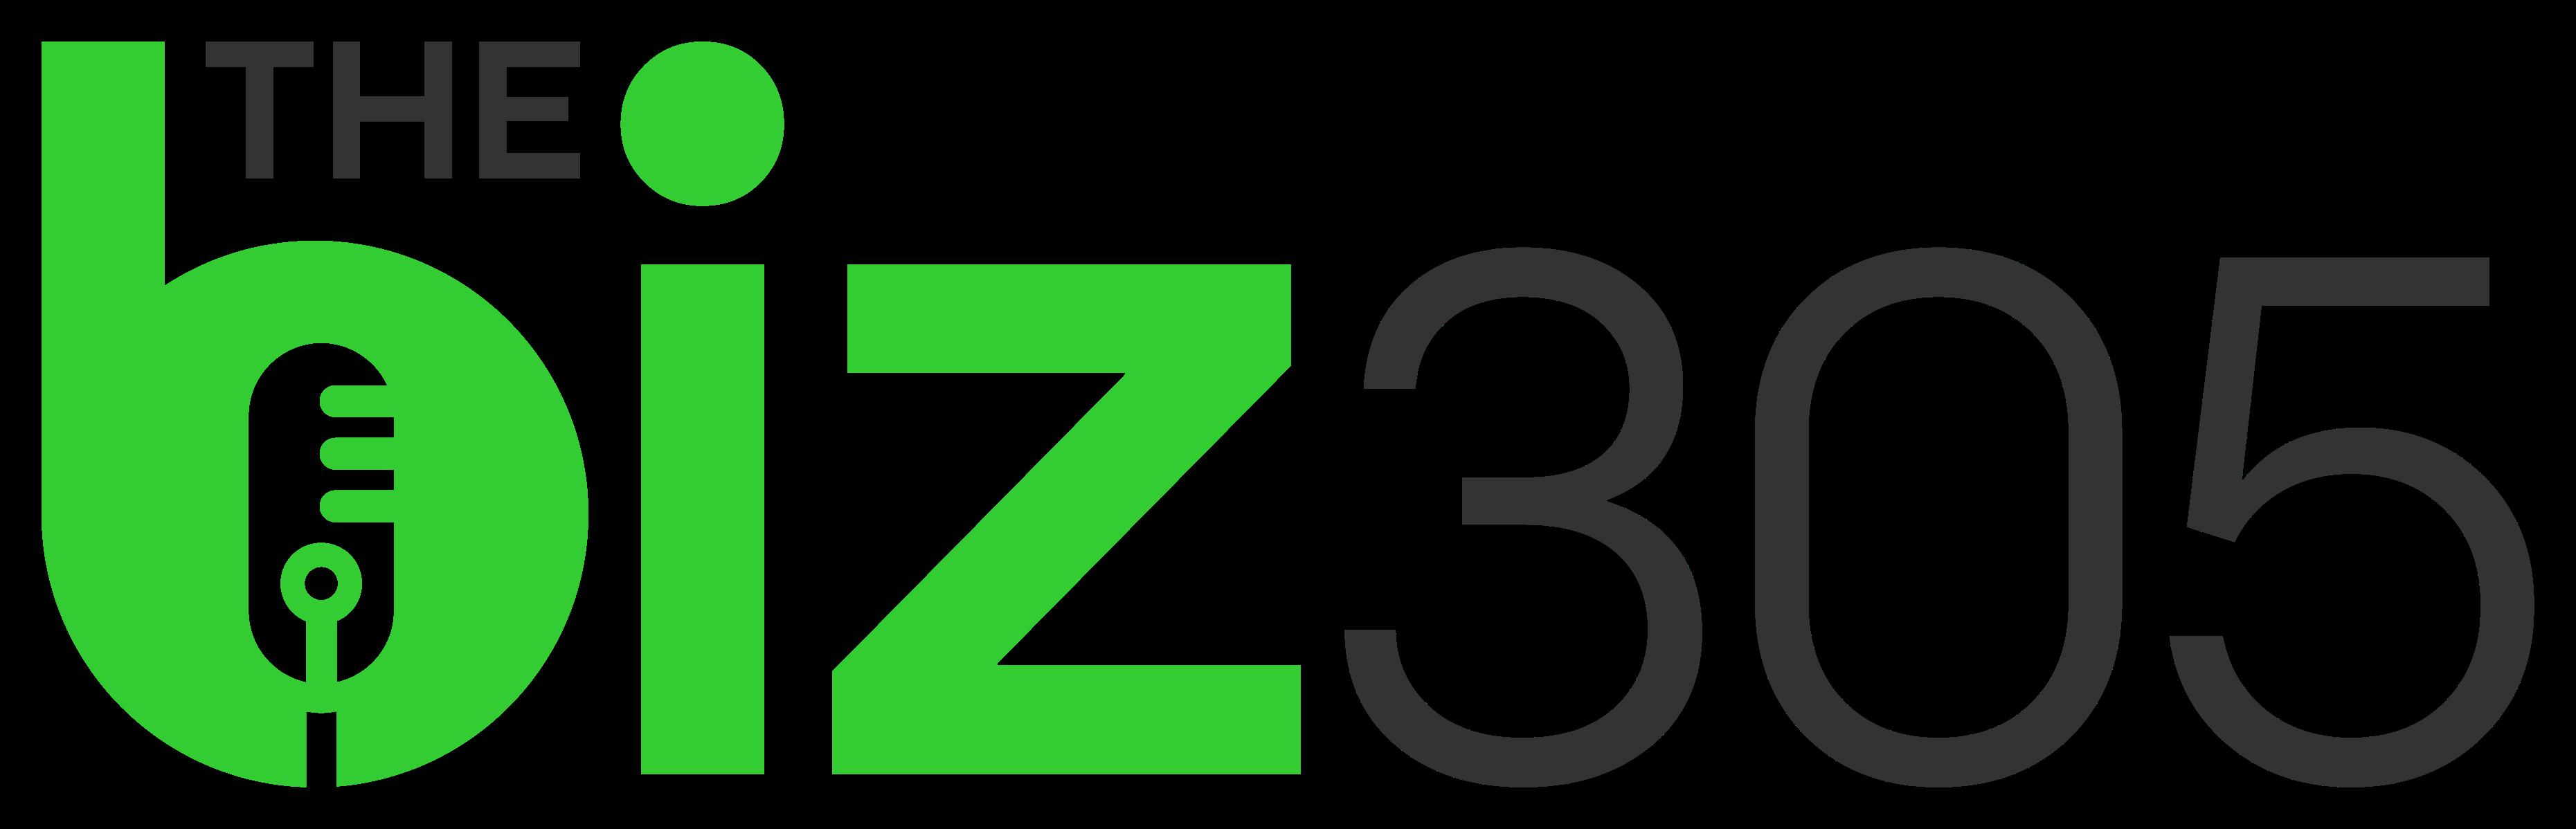 THE-BIZ-305